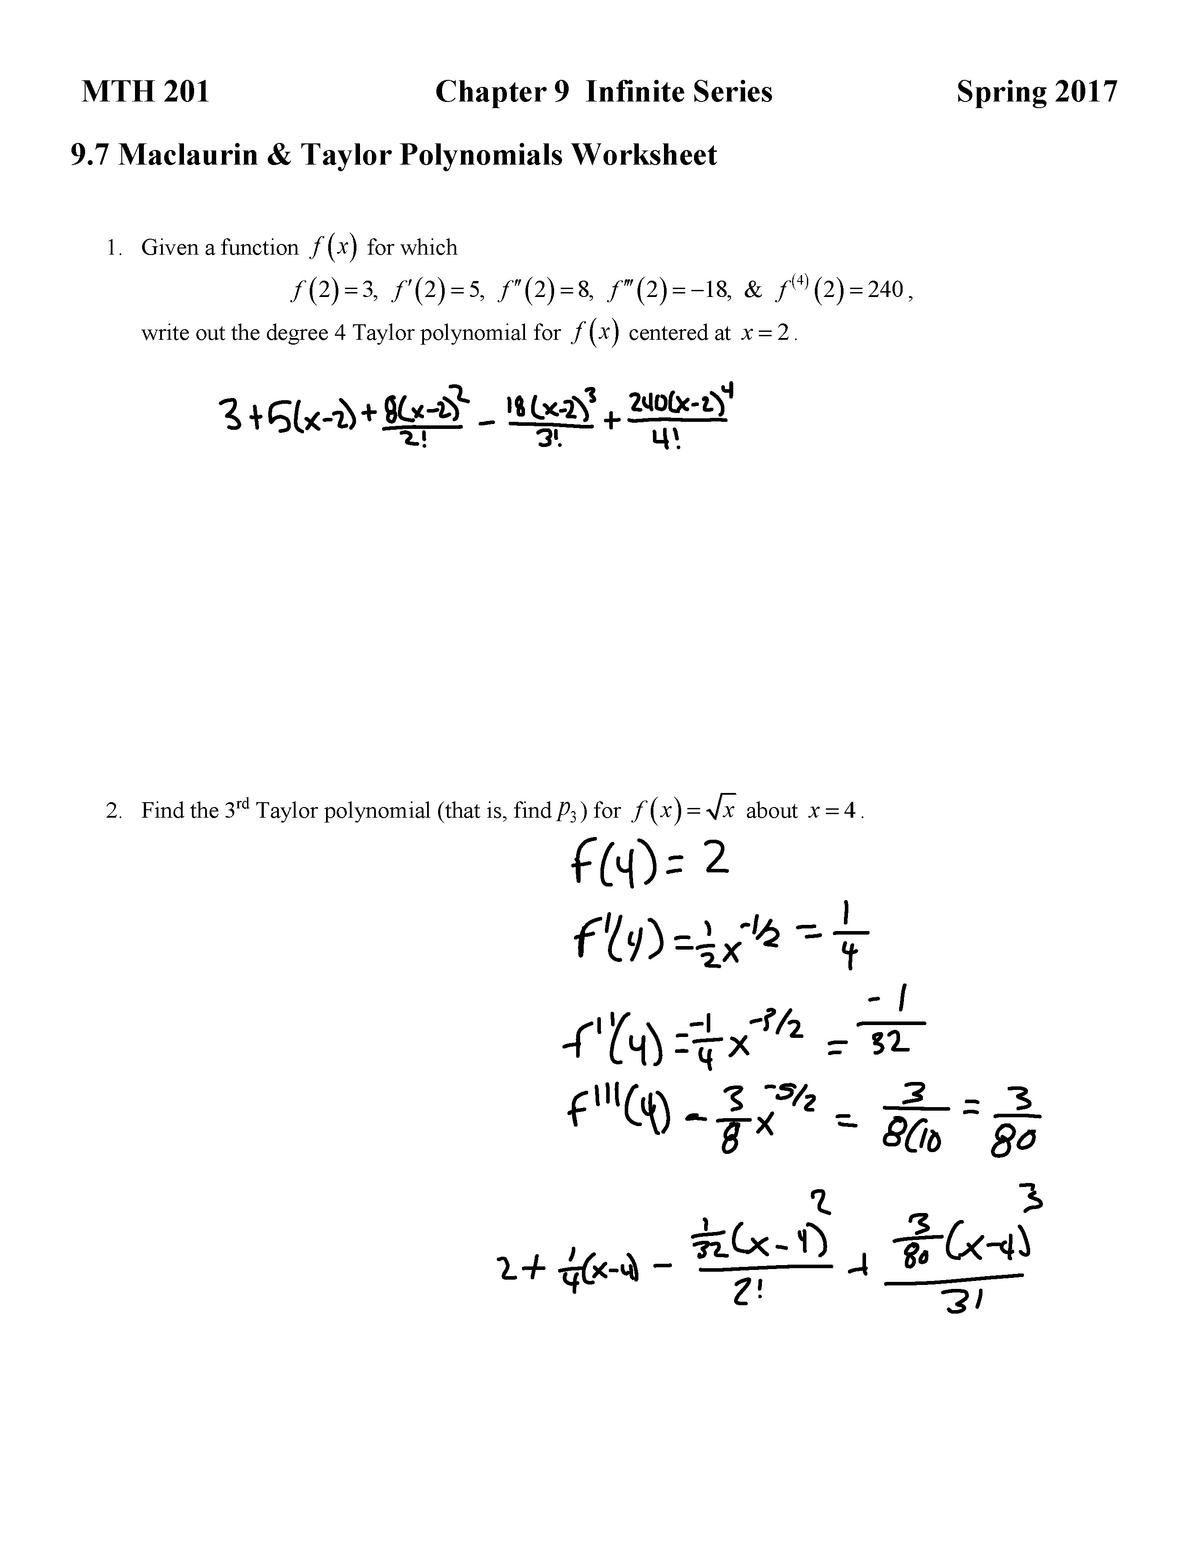 9 7 Maclaurin Taylor Polynomials Worksheet - MTH 201 - StuDocu